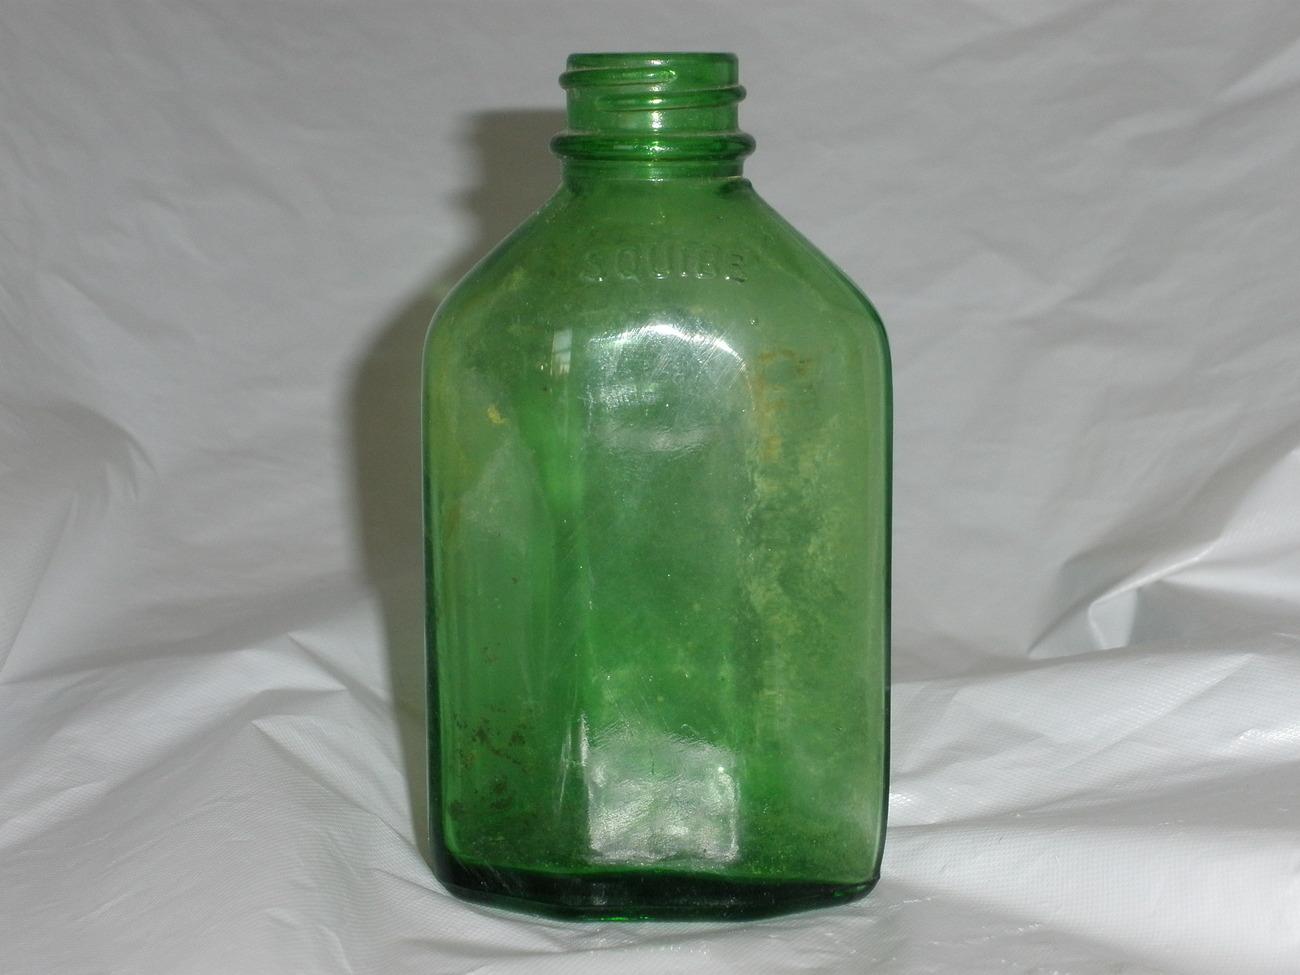 Squibb medicine bottle